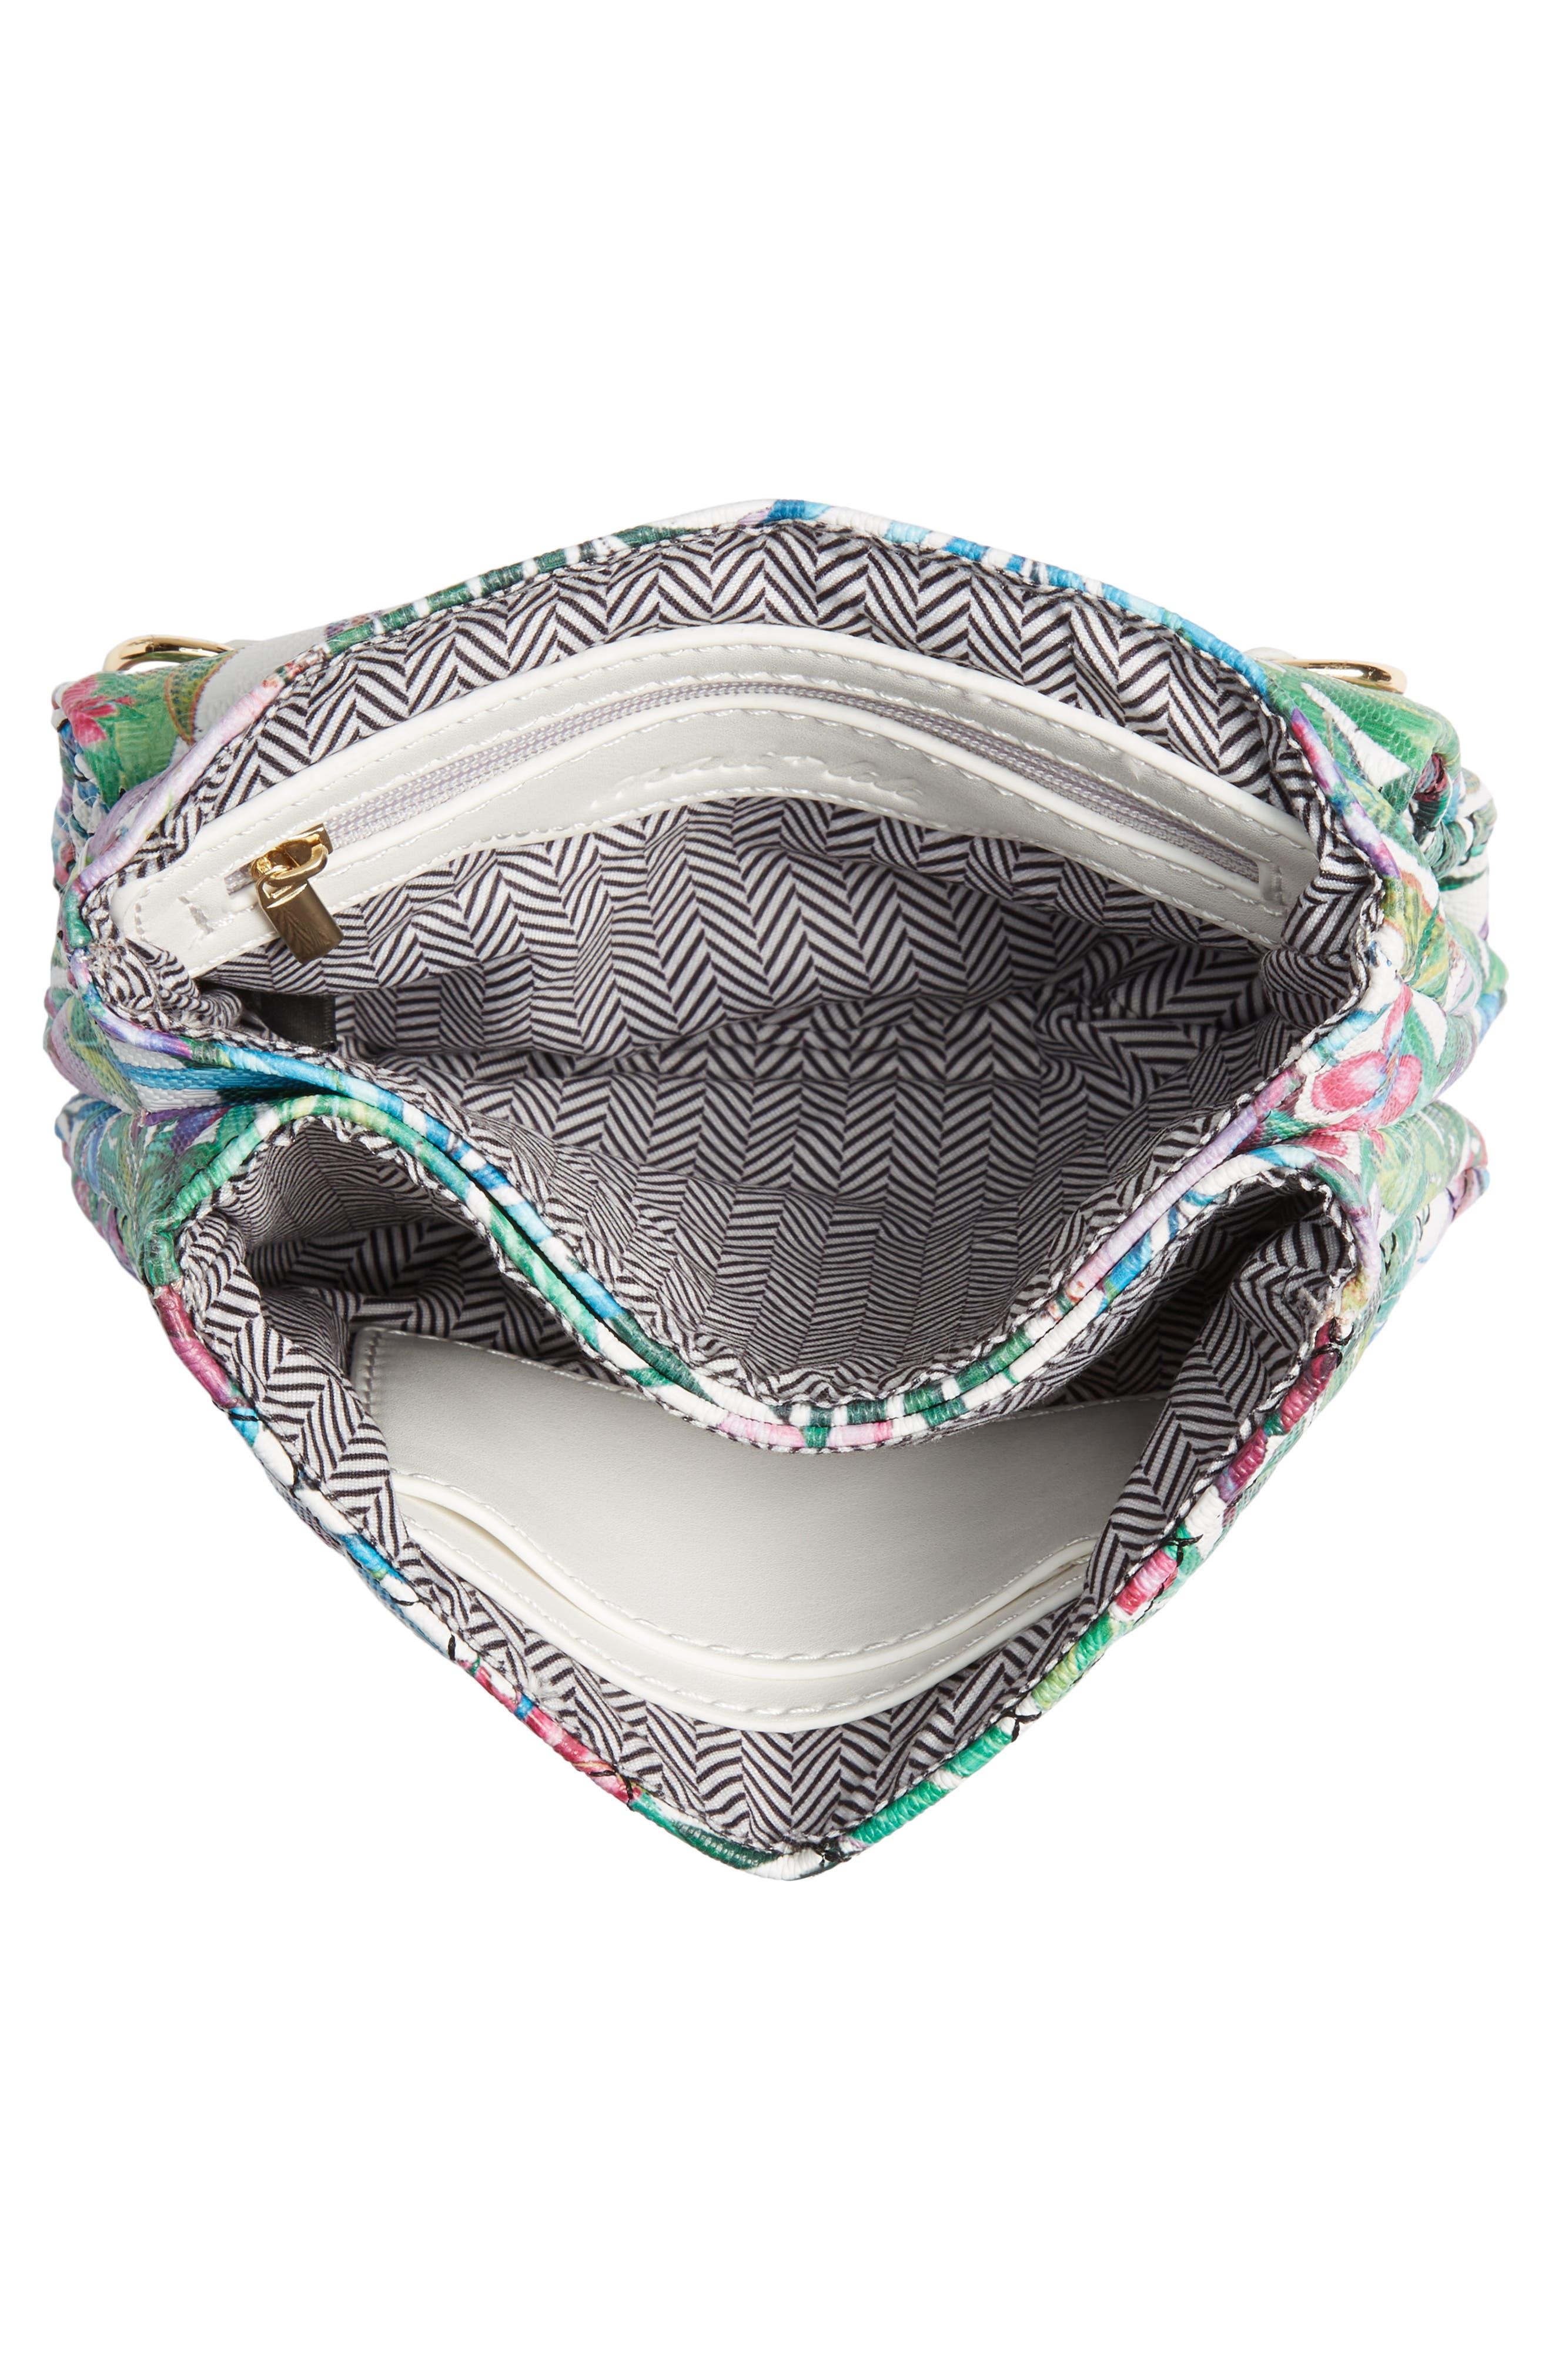 MALI + LILI, Quilted Vegan Leather Belt Bag, Alternate thumbnail 7, color, 101